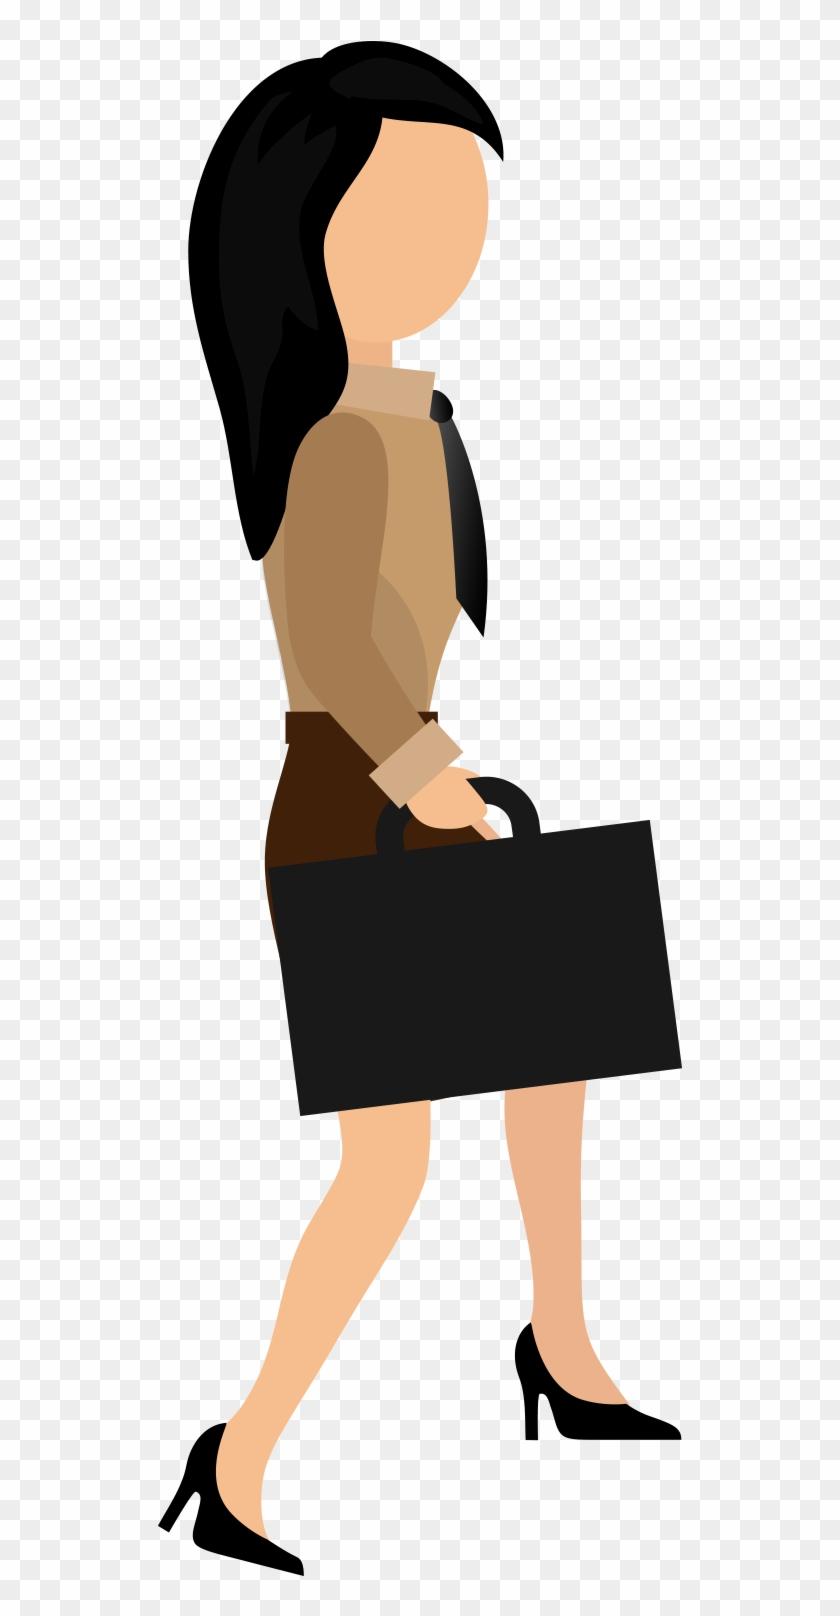 Businessperson Flat Design - Businessperson Flat Design #512956